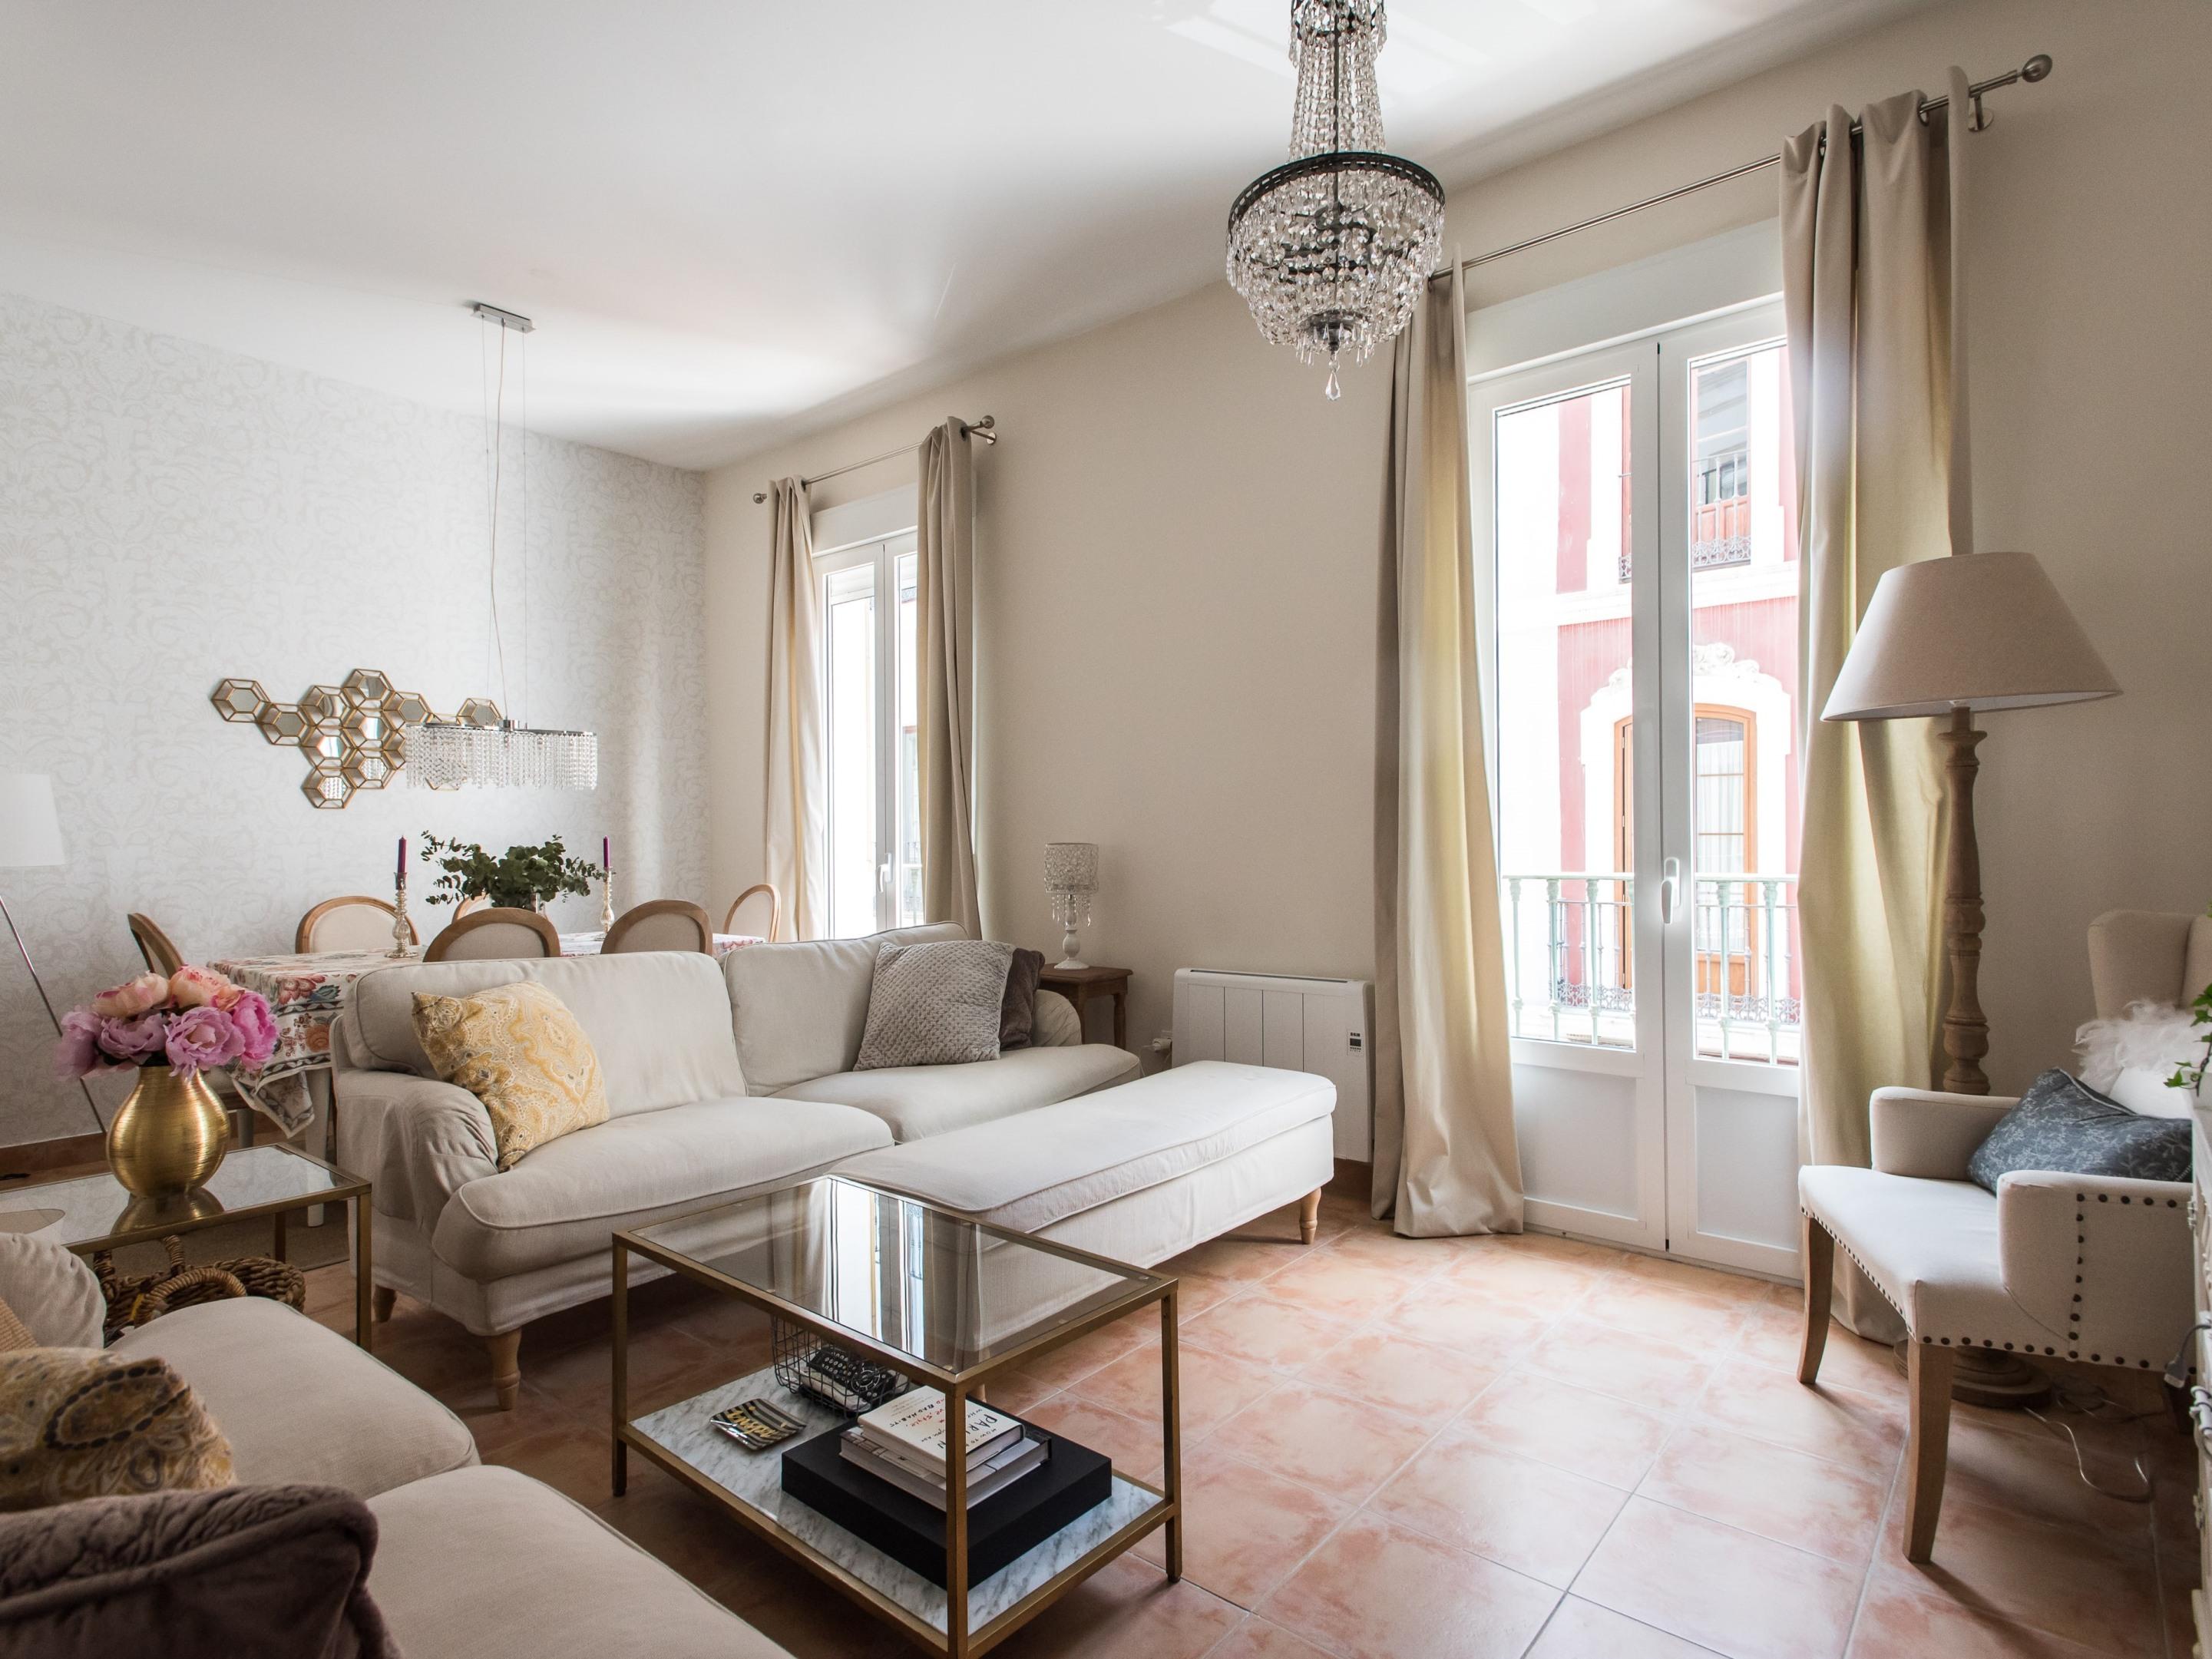 Apartamento-HERNANDO COLON 9-De Lujo-Baño con bañera-Vista a la Calle - Tarifa Base